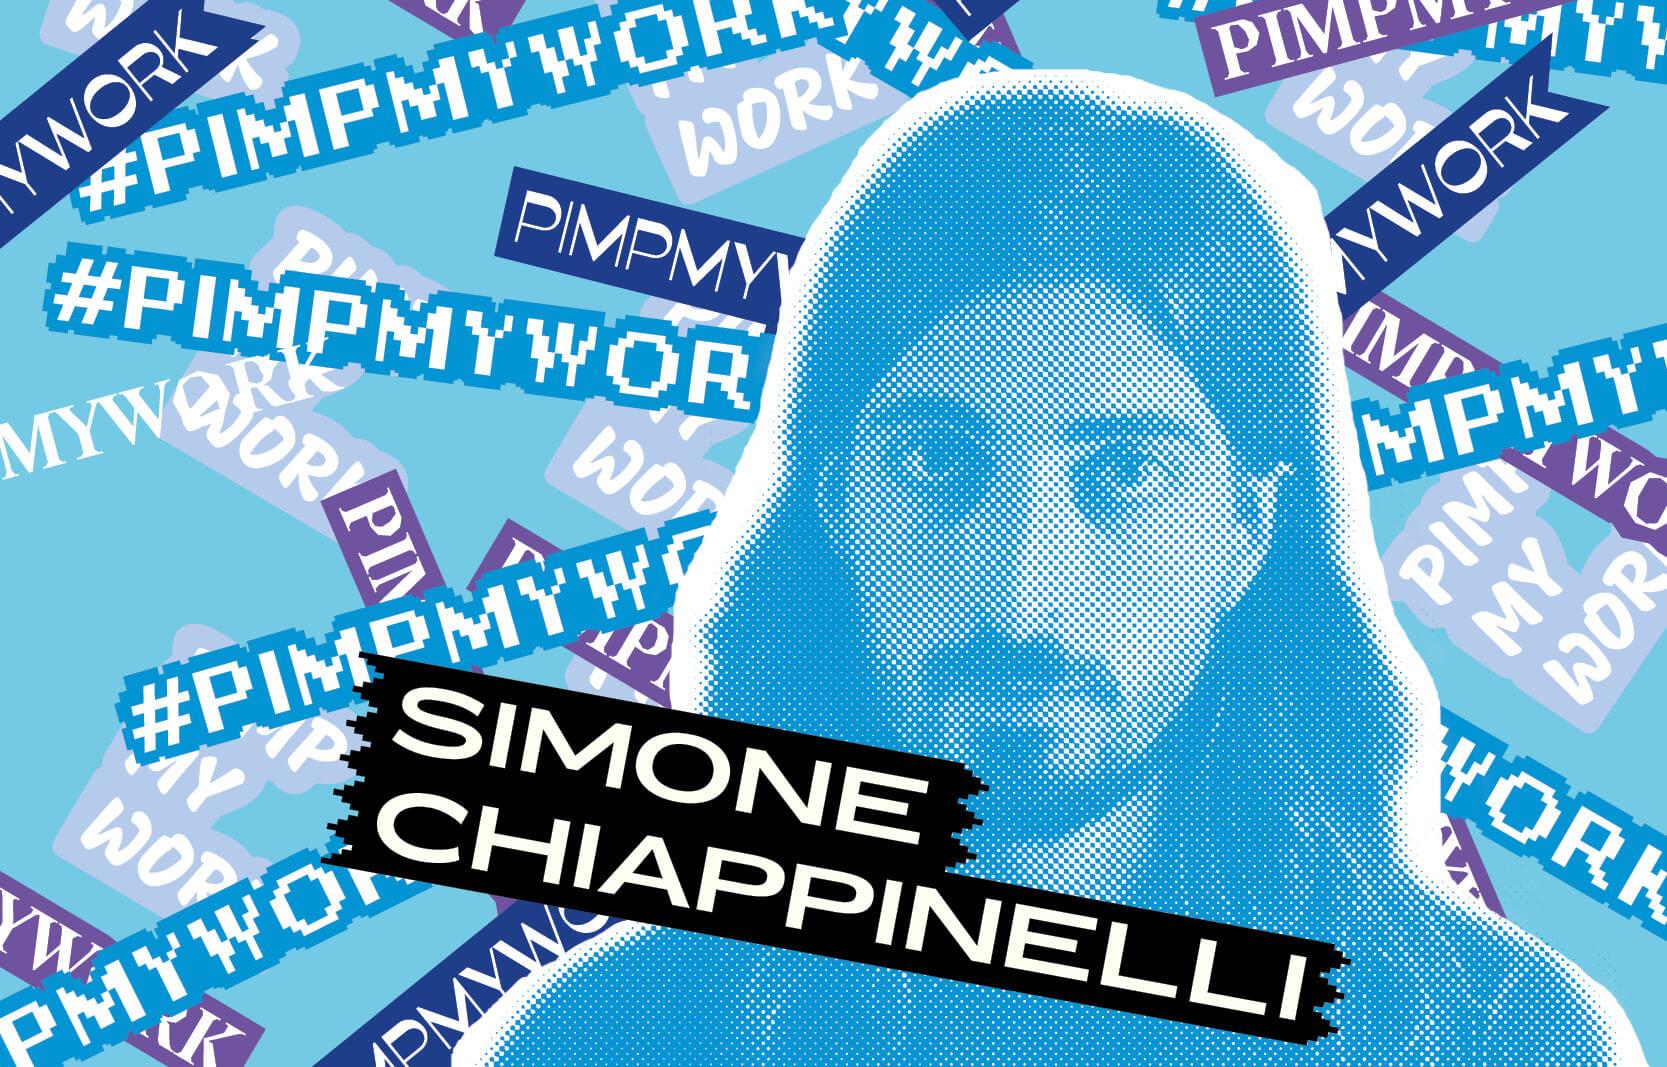 Simone Chiappinelli